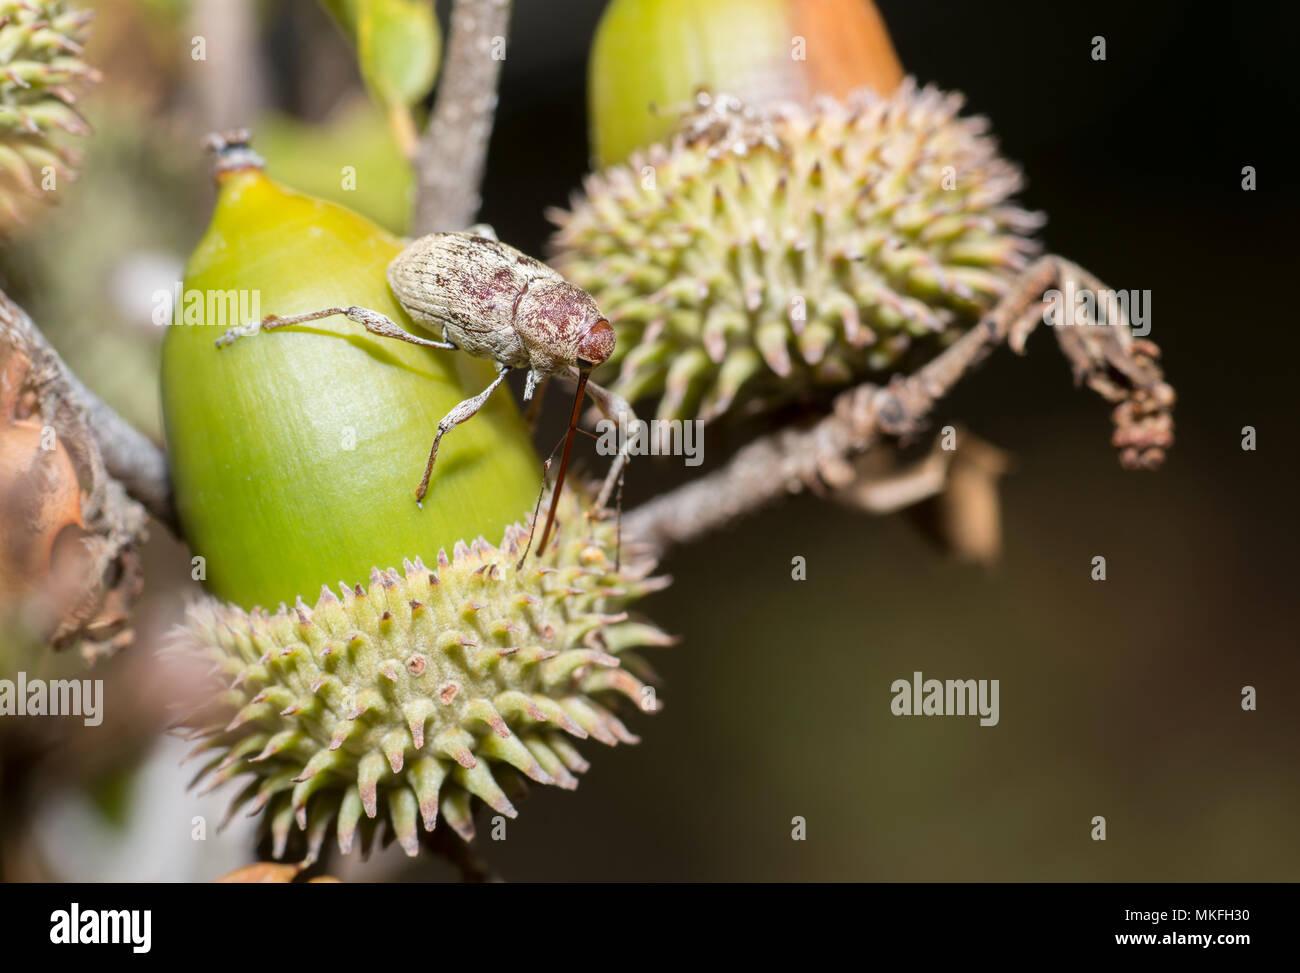 Acorn weevil (Curculio glandium) piercing an acorn of kermes oak (Quercus coccifera), Mercantour National Park, Alps, France - Stock Image